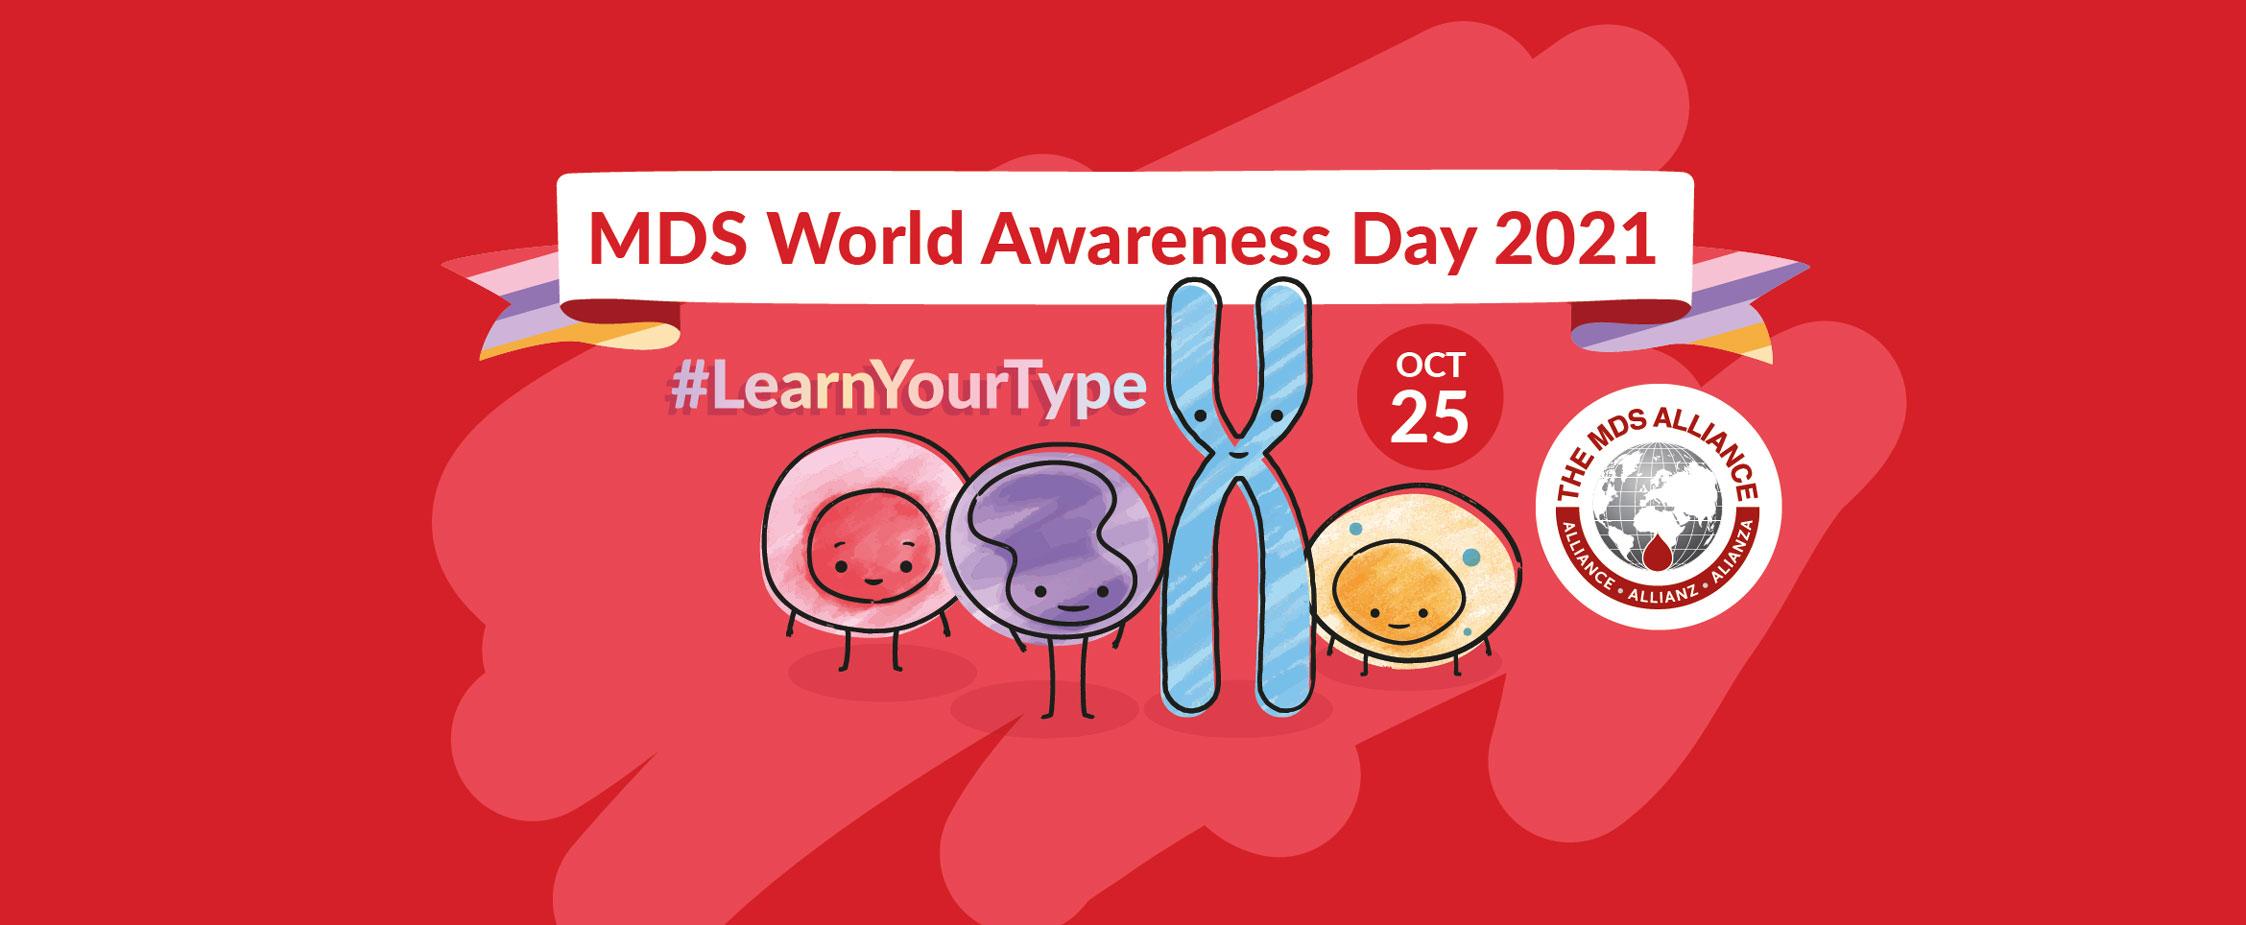 MDS World Awareness Day 2021